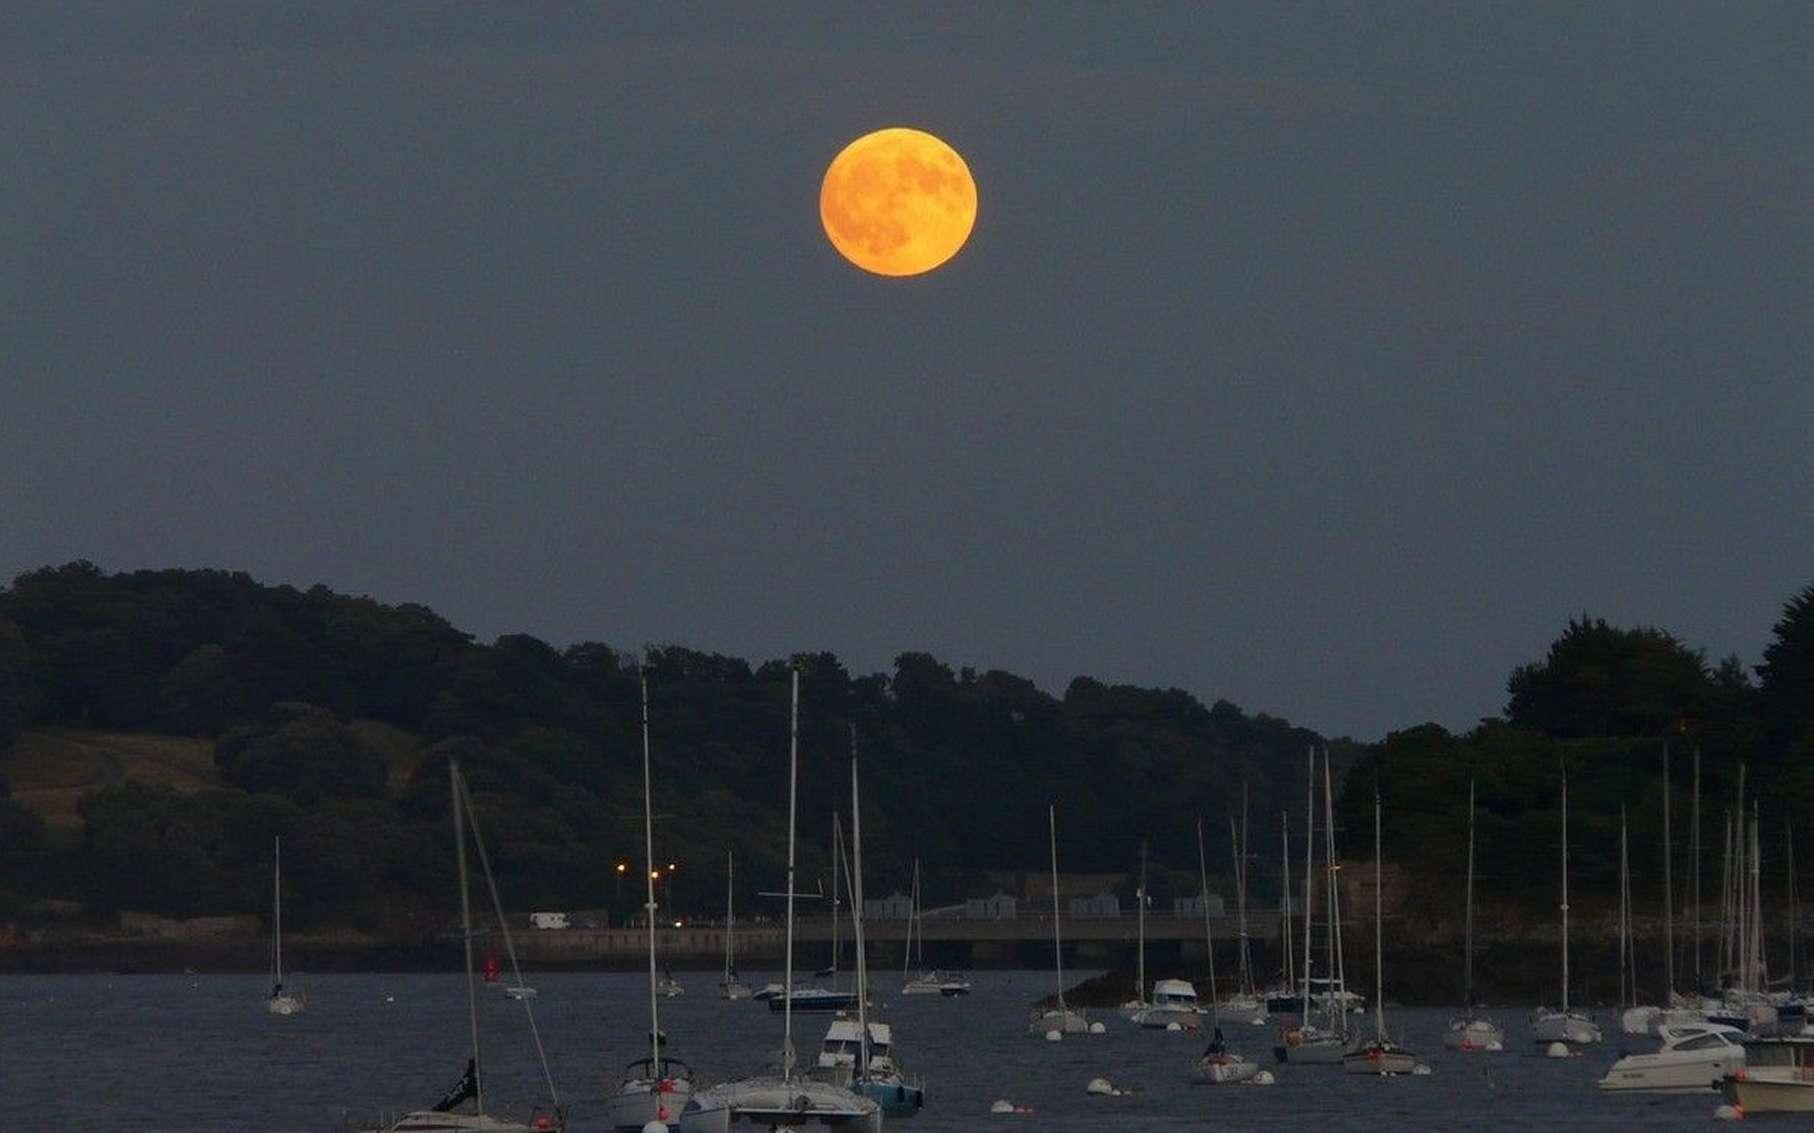 En avril, suivez la Lune... © Jean-Baptiste Feldmann